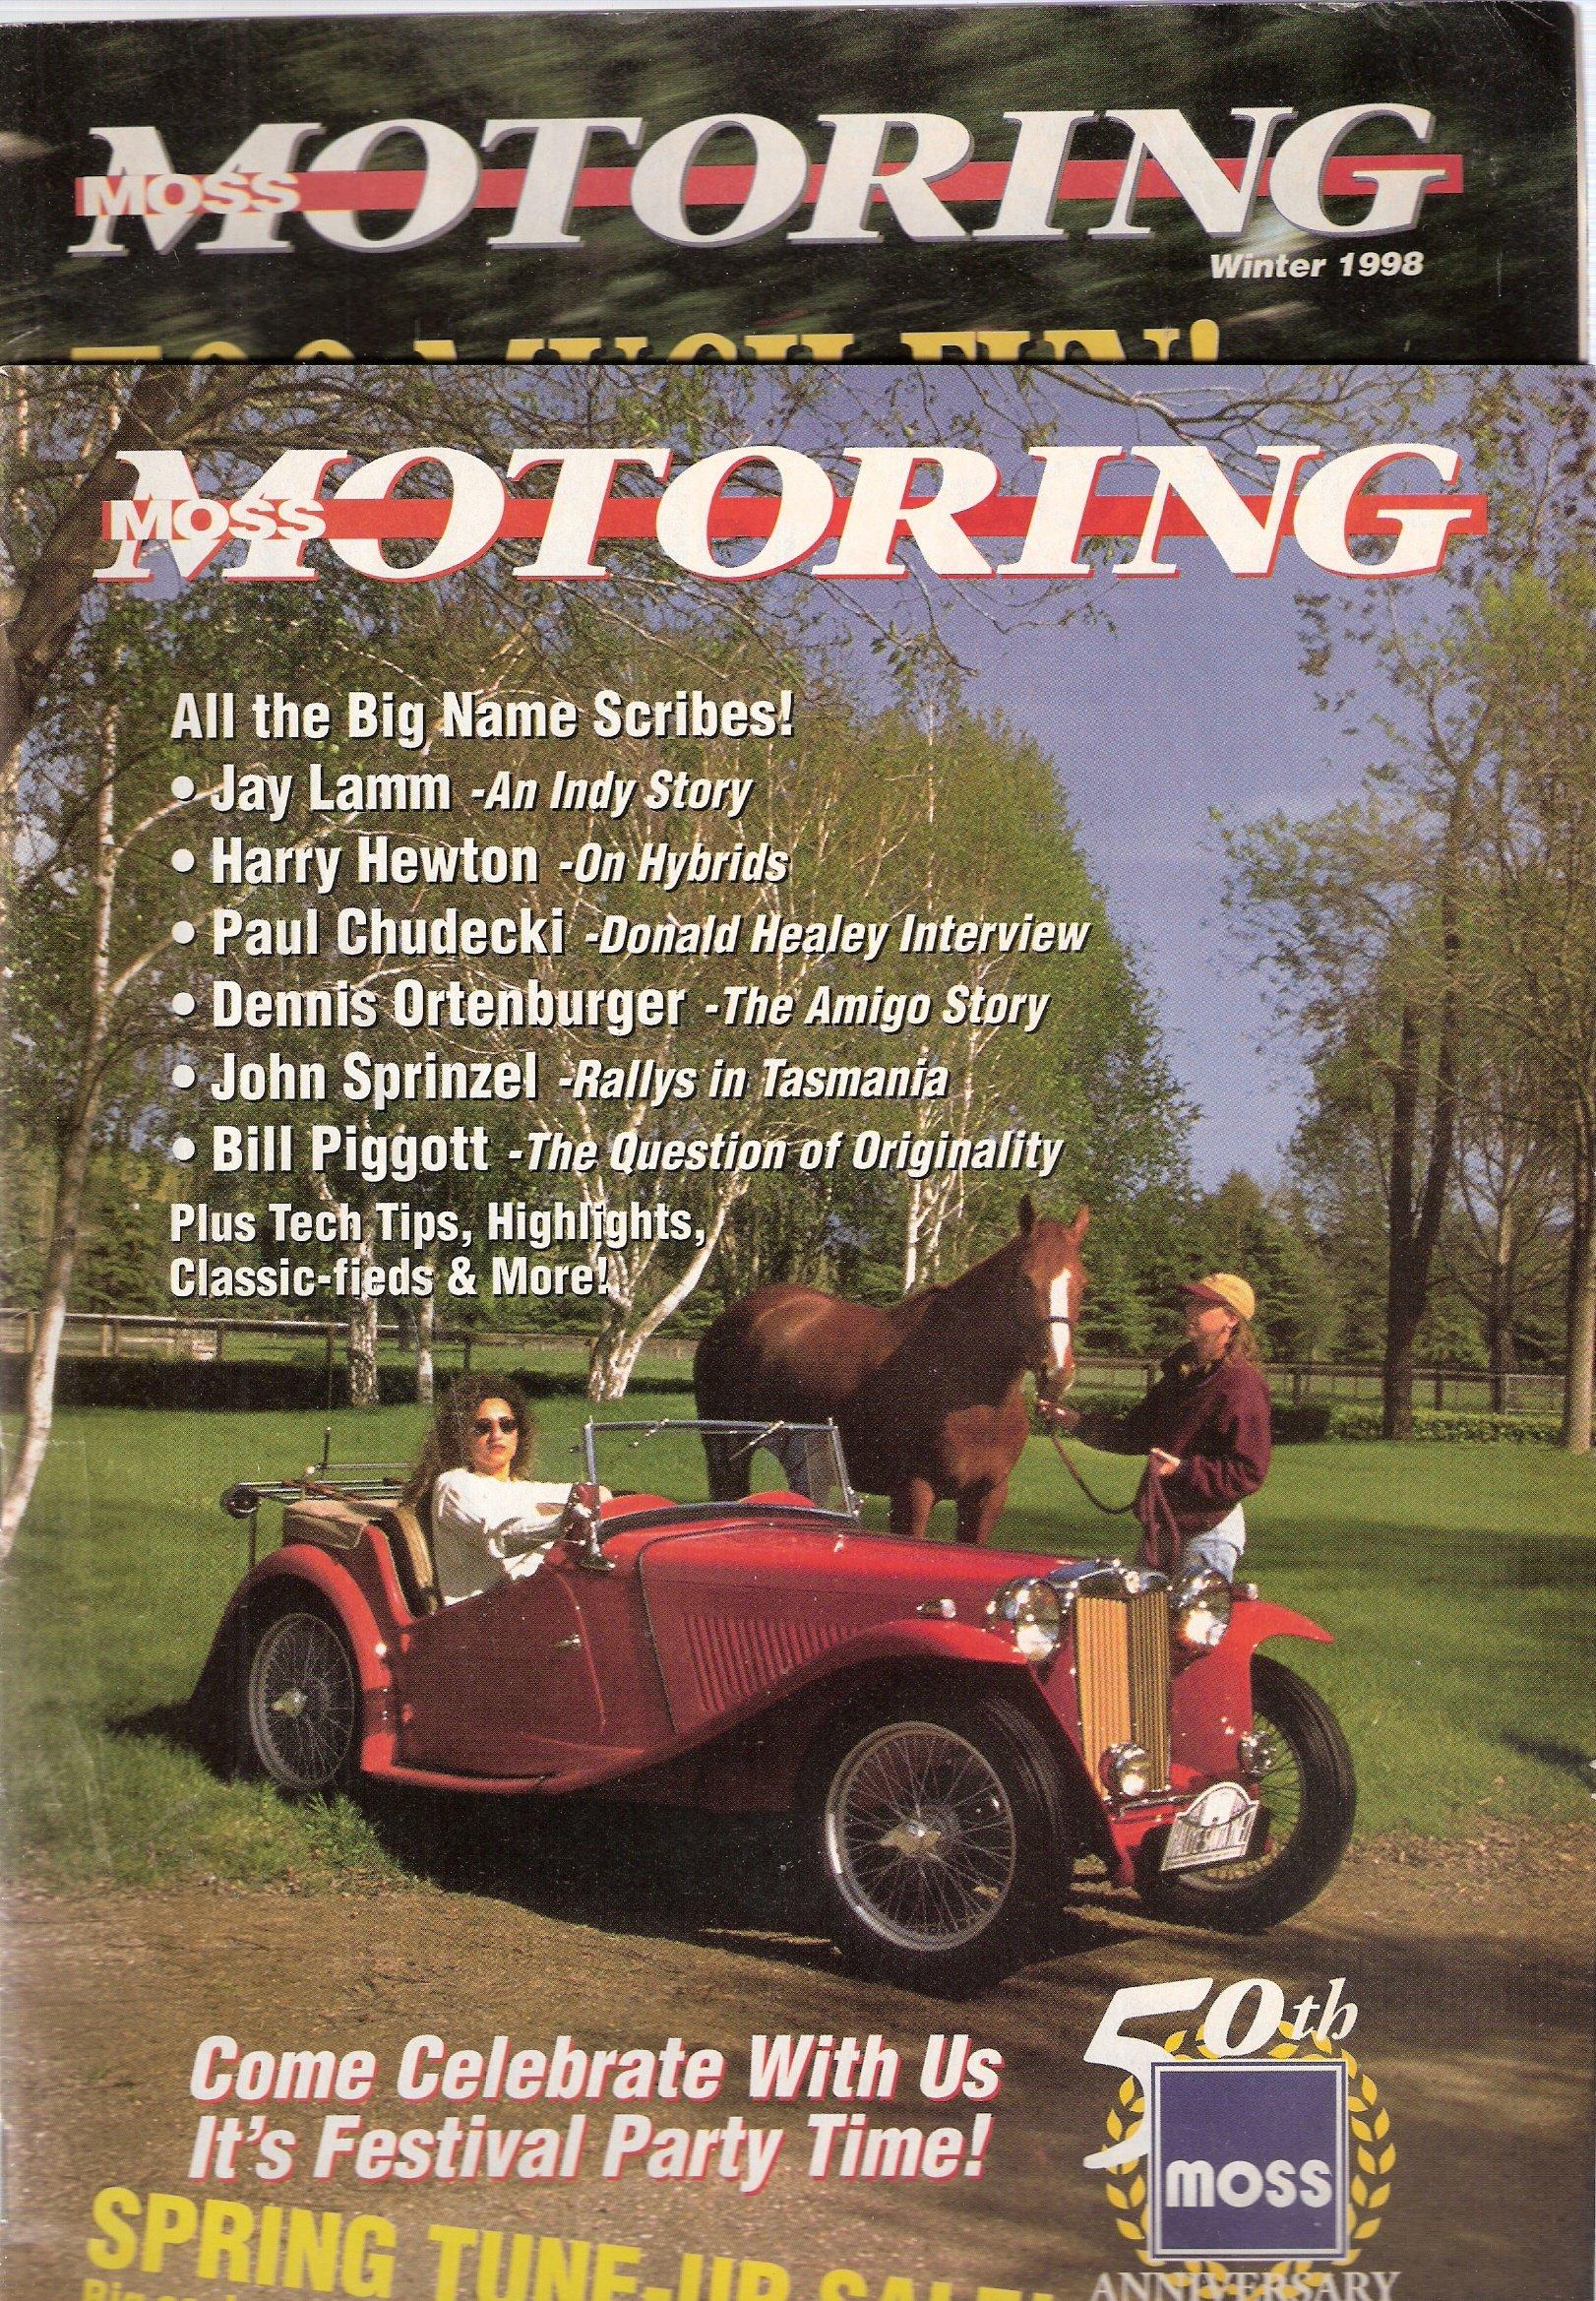 Moss Motoring 1998 (Vol XVII  No  II and Vol  XVII No  IV